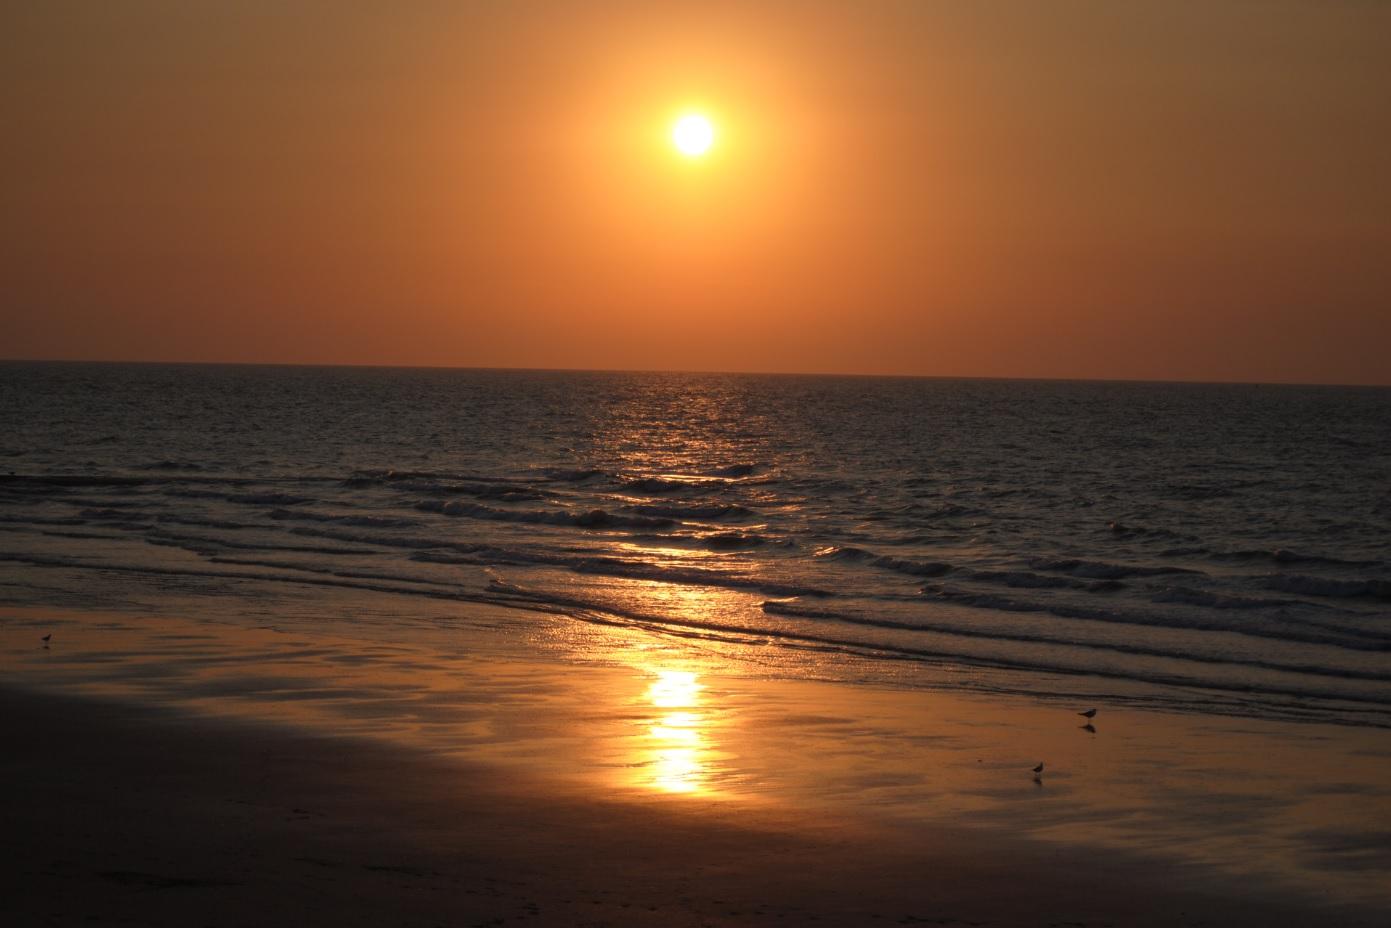 Sonnenuntergang in Belgien an der Nordsee